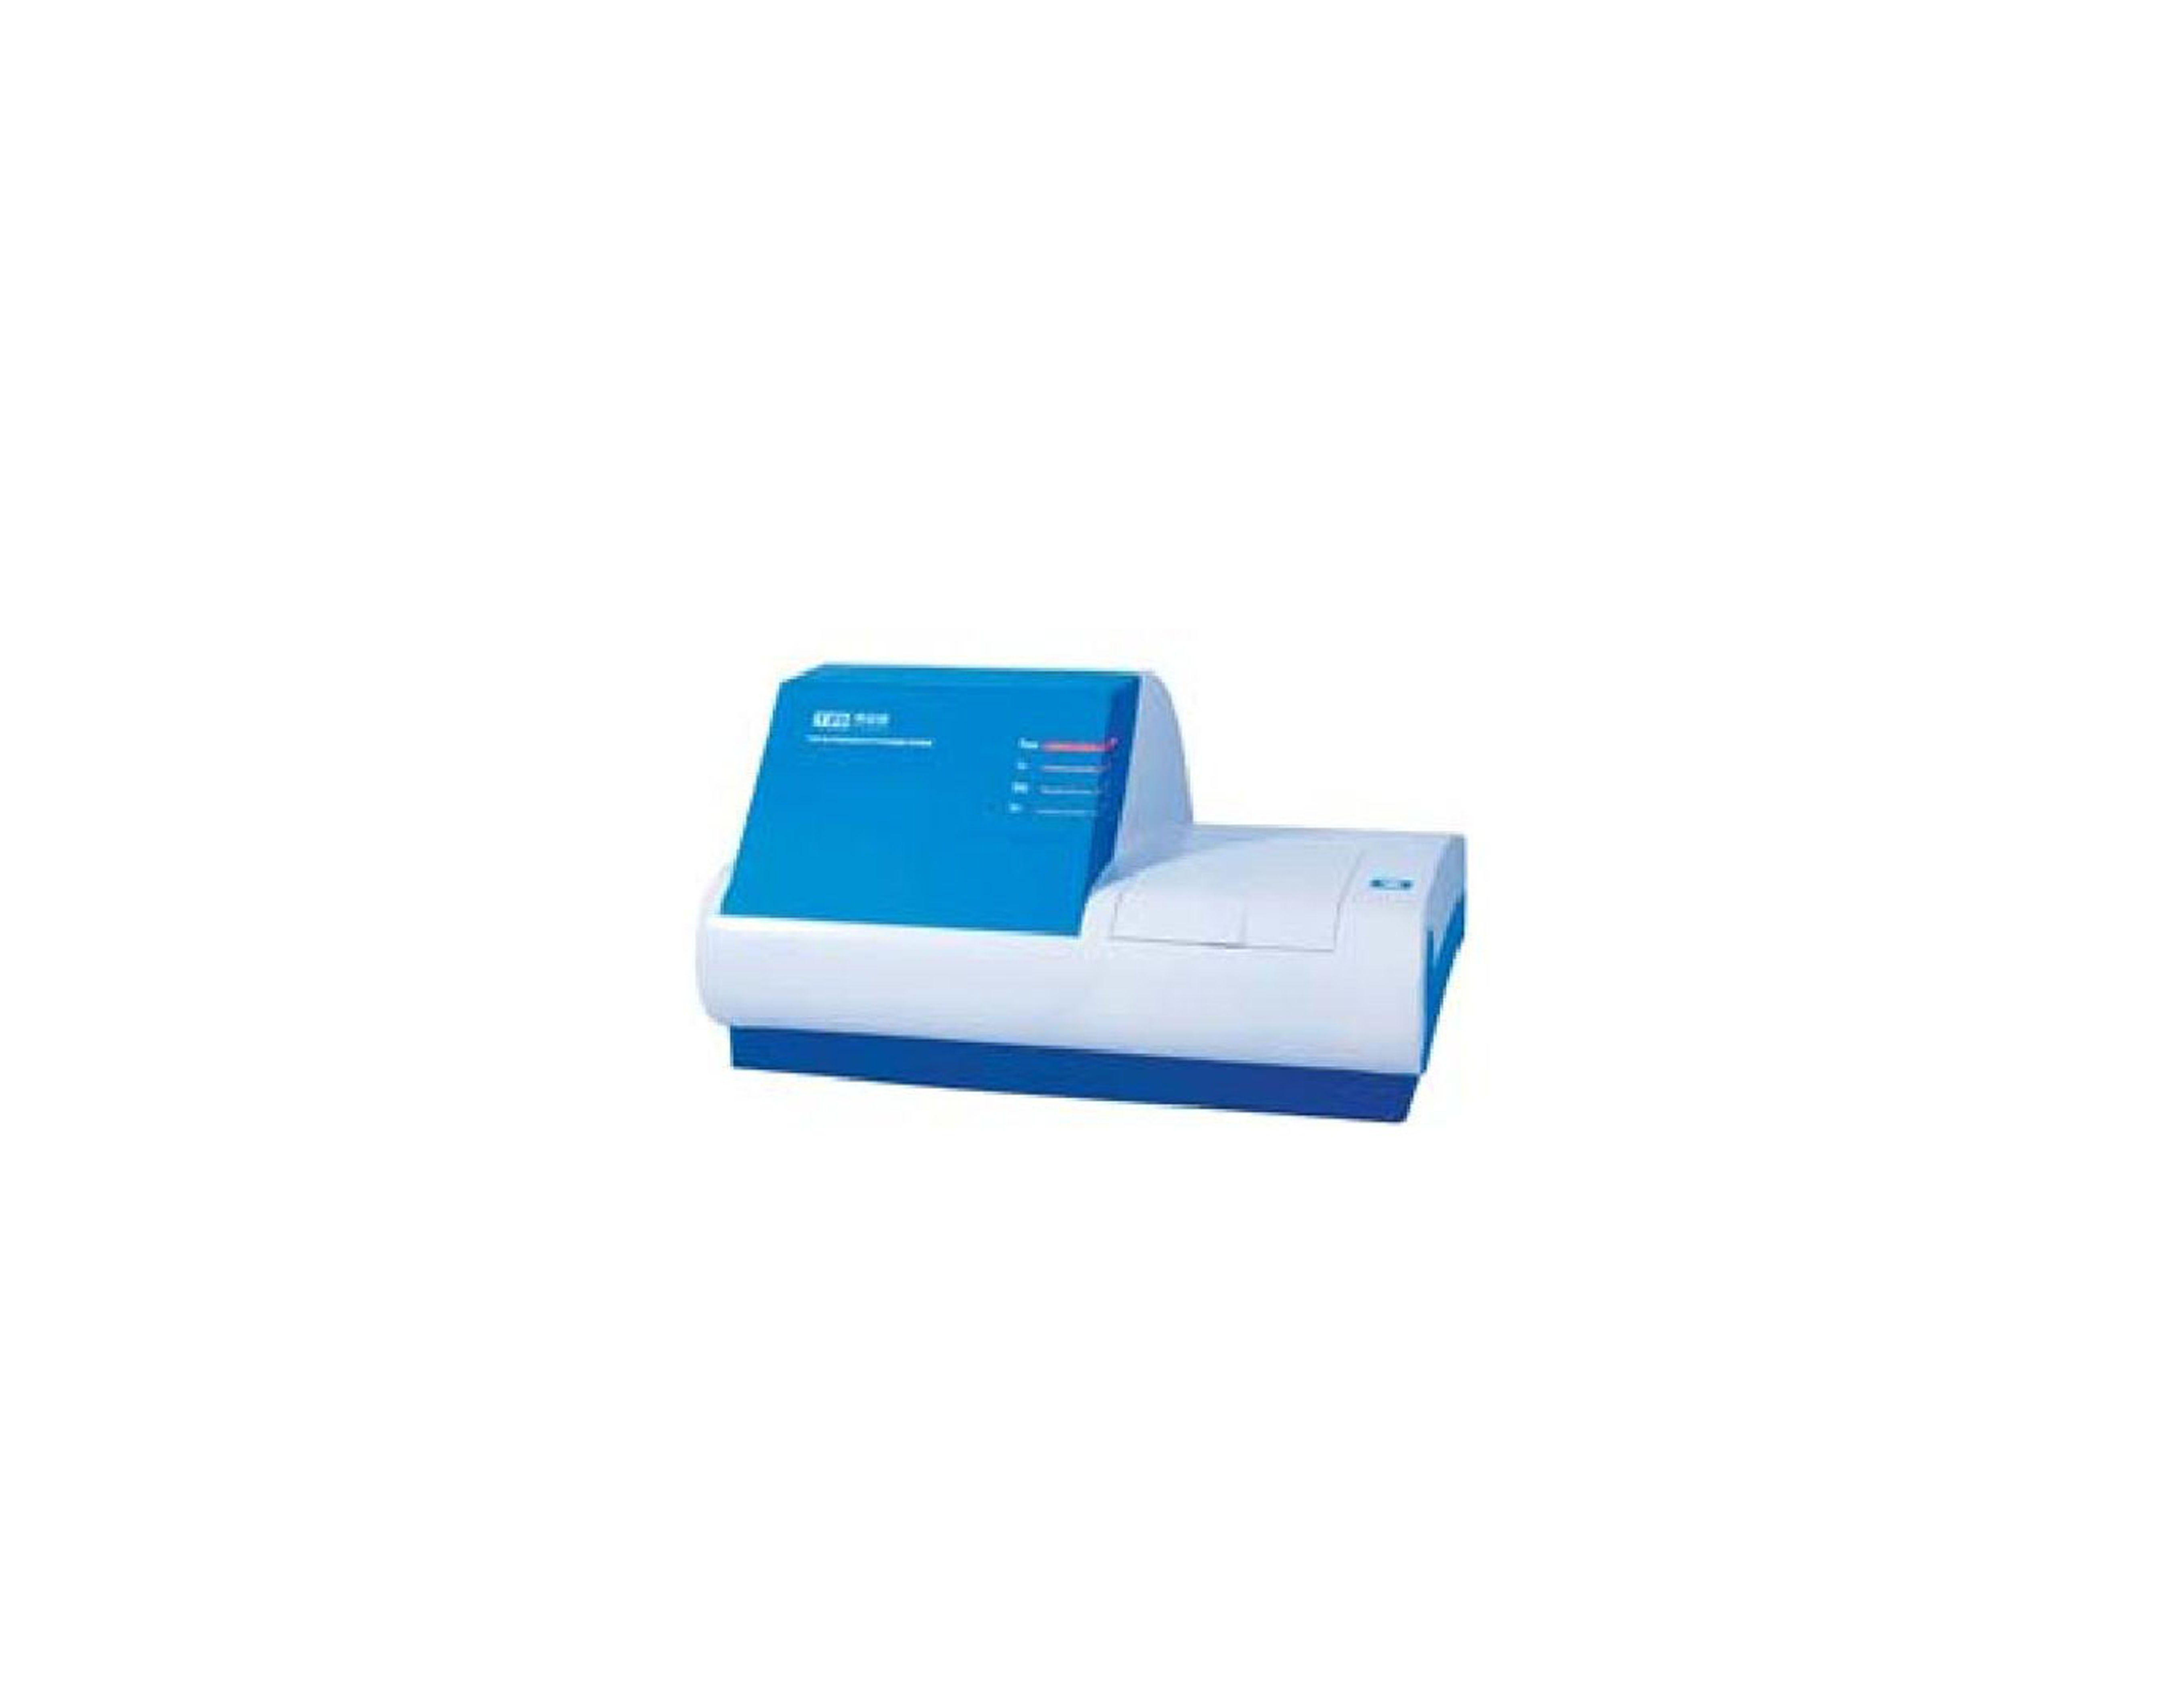 TZD-CL-200S 化學發光免疫分析儀